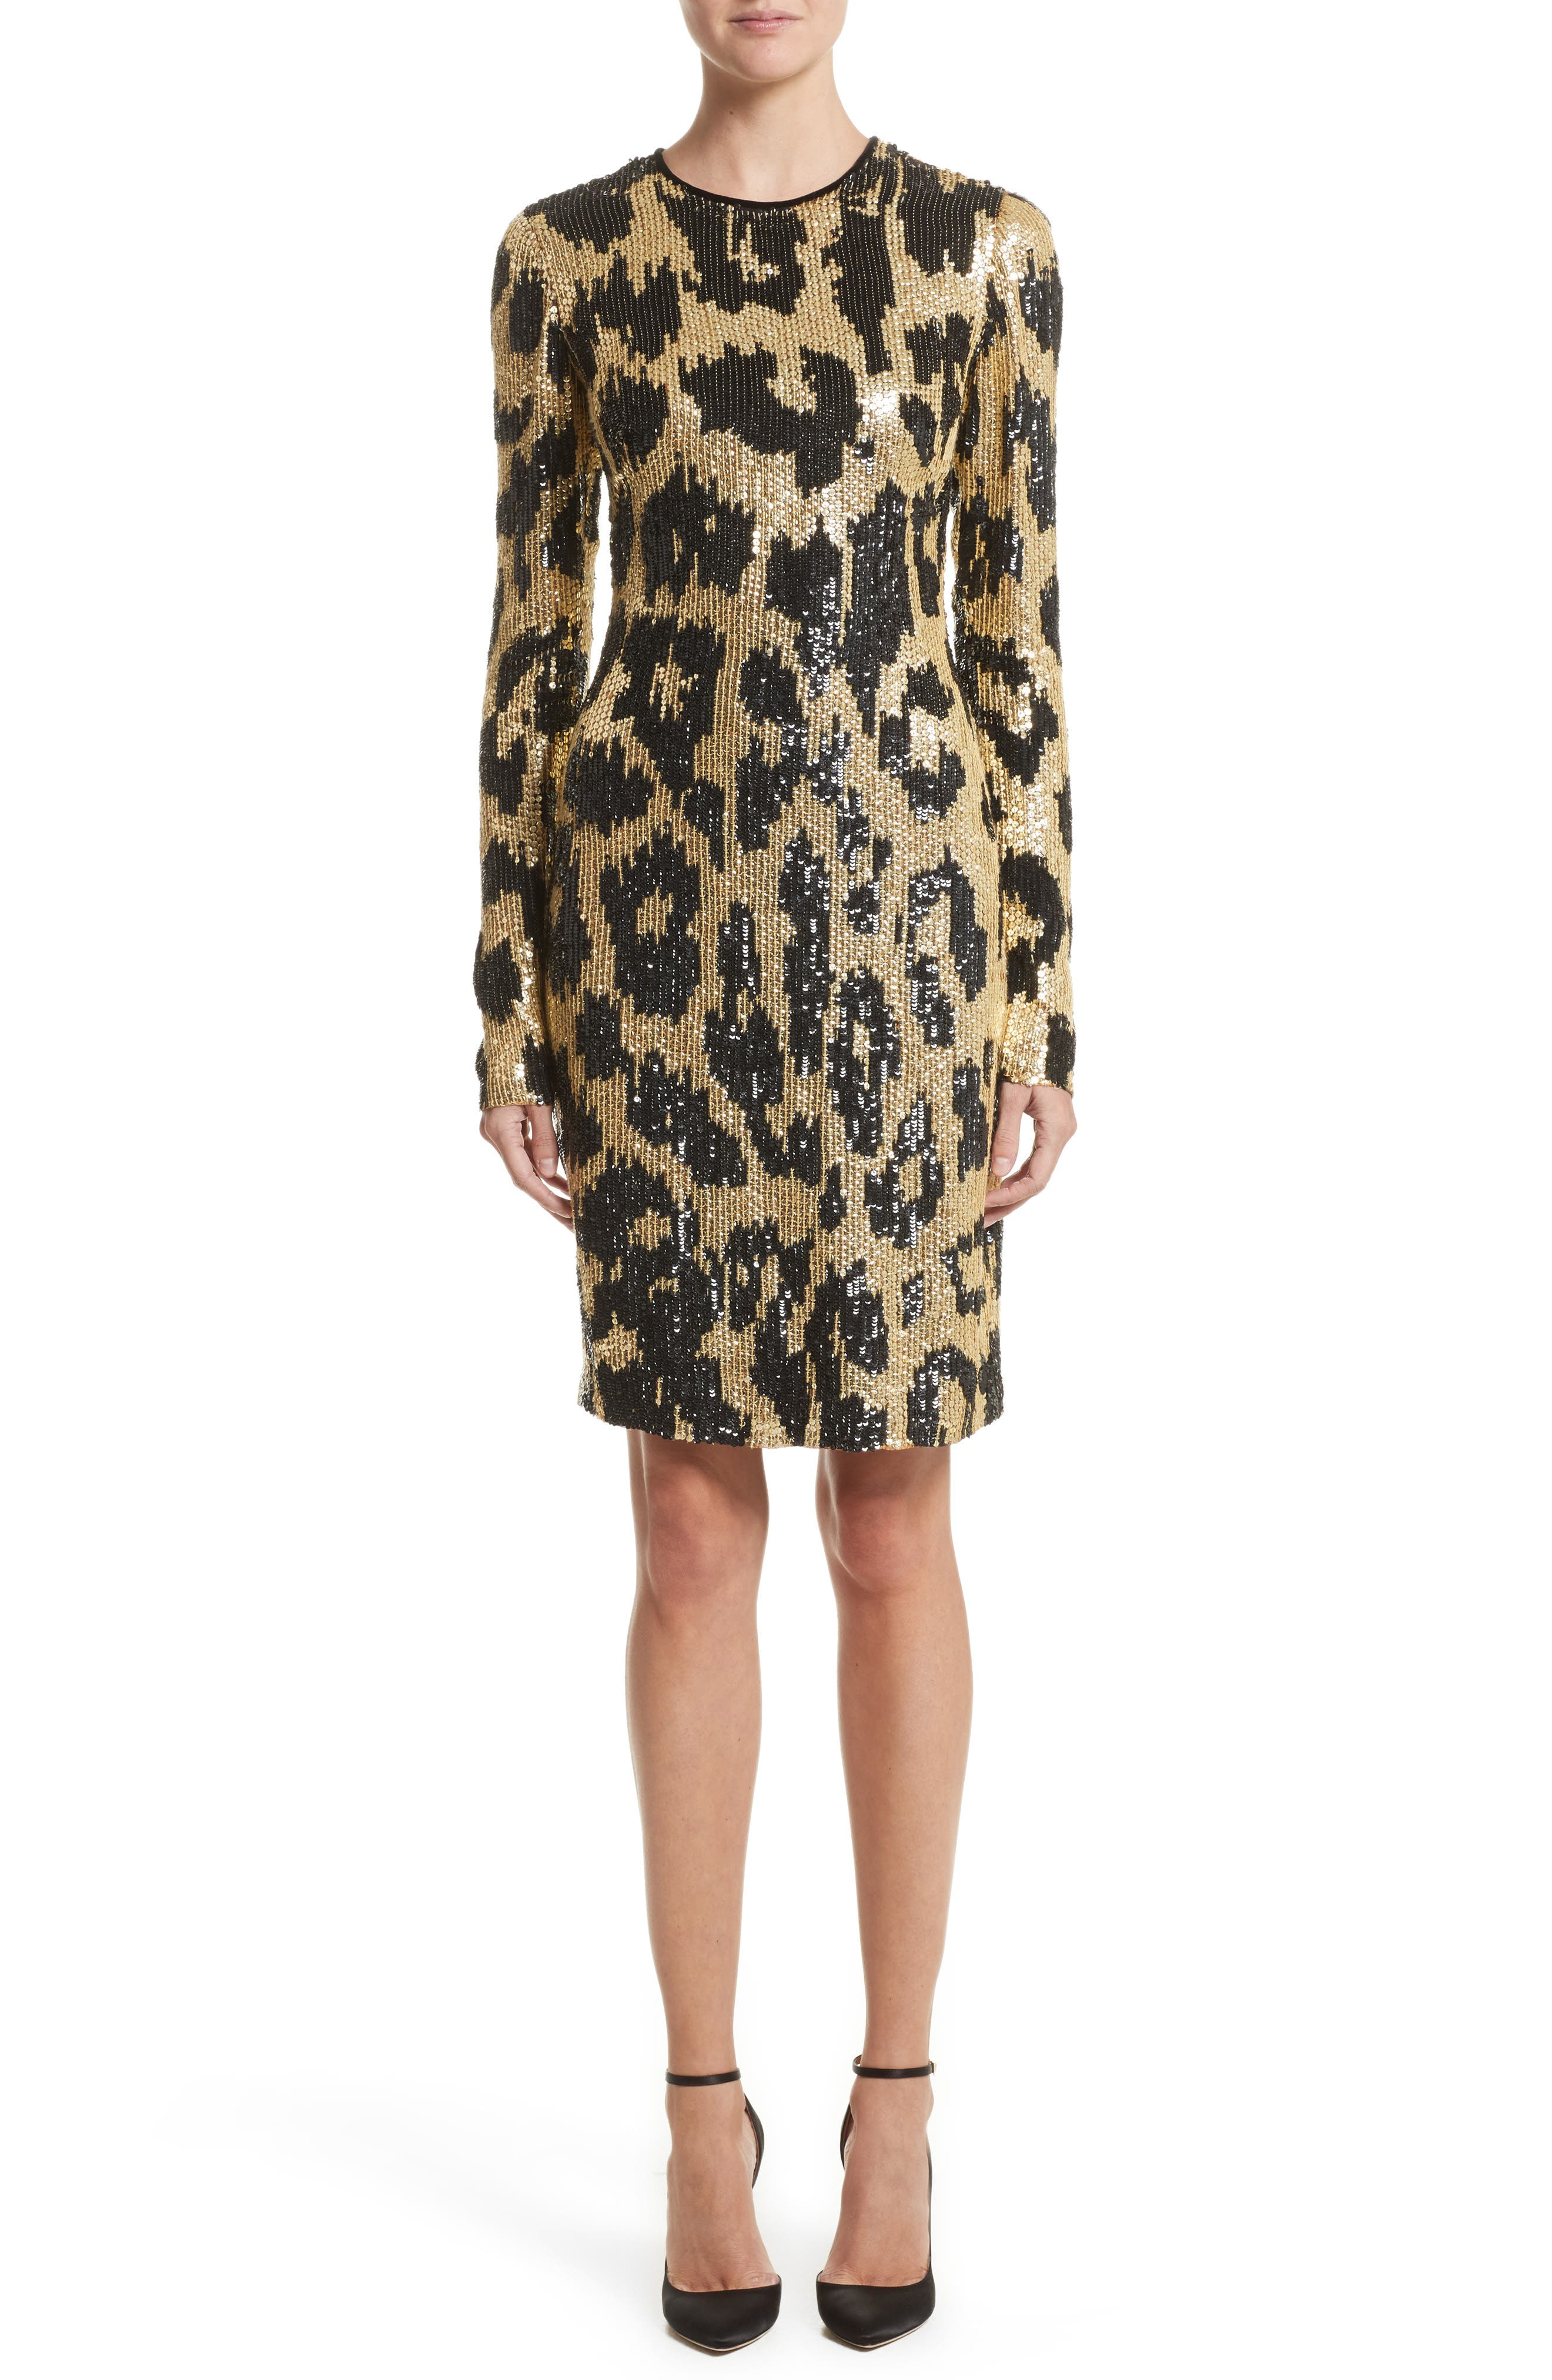 Naeem Khan Cheetah Print Sequin Sheath Dress